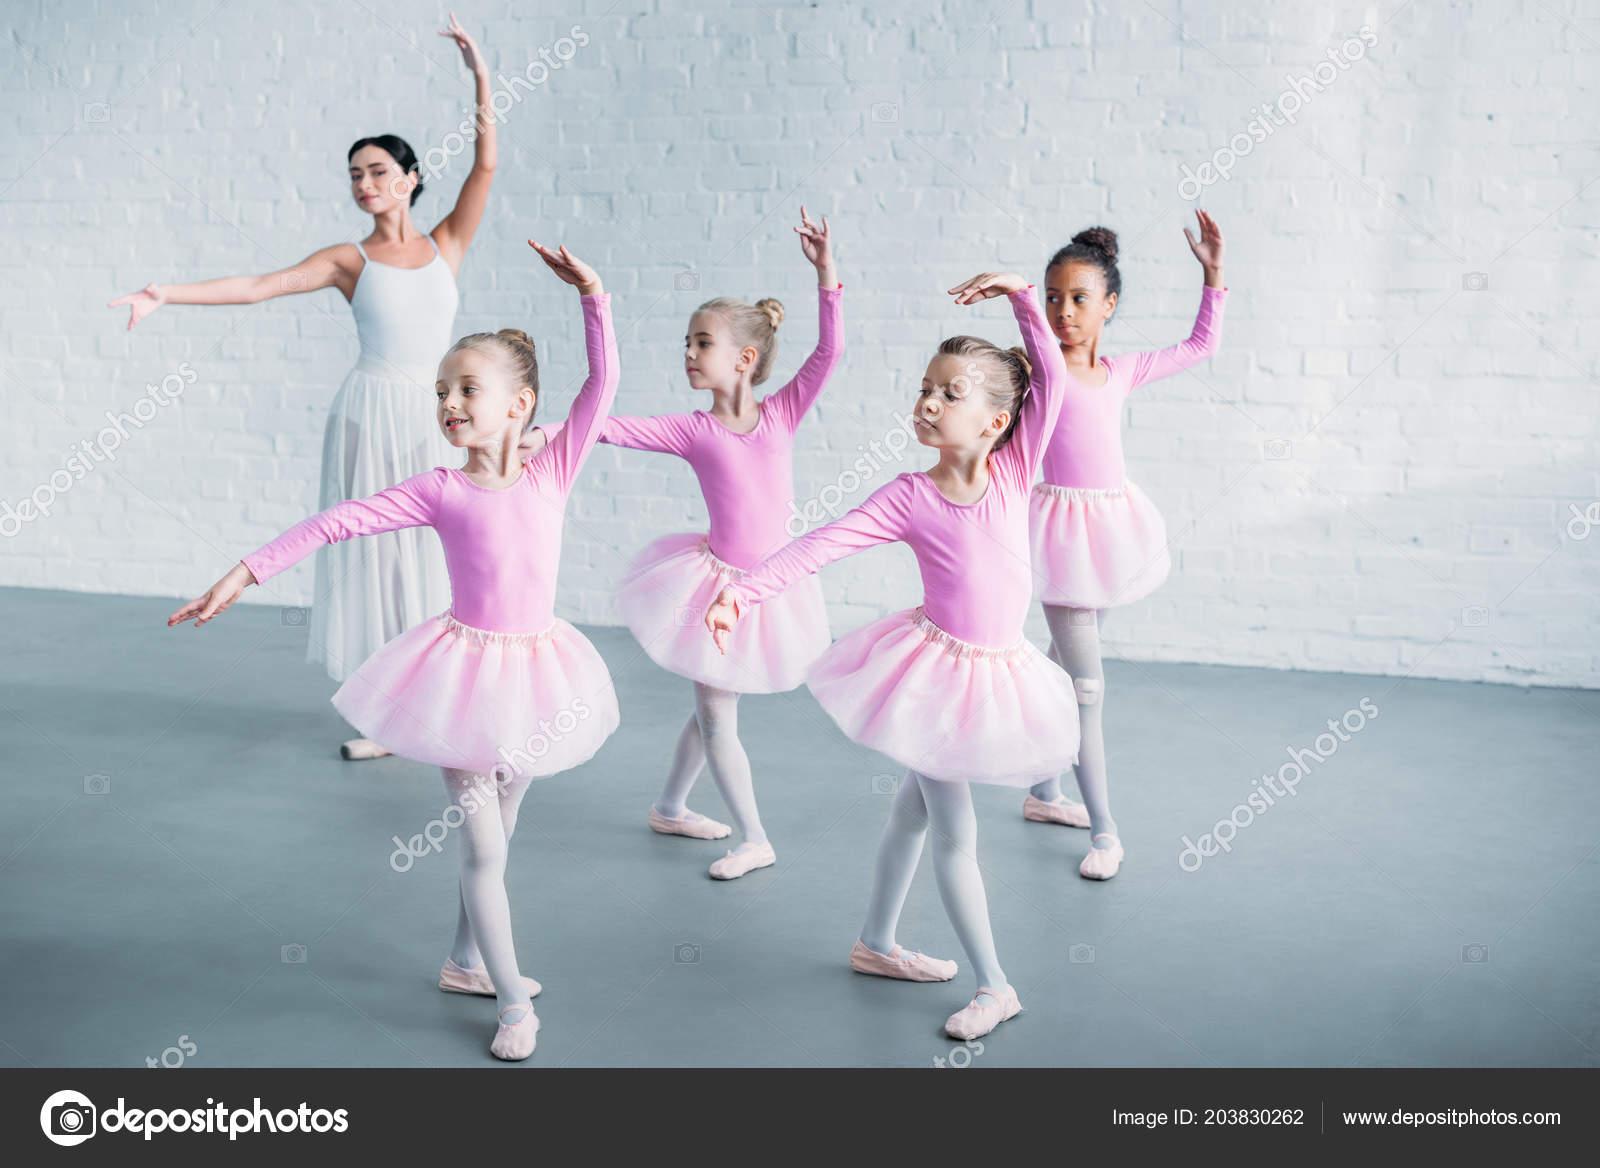 86c1e6c6aab Αξιολάτρευτα Πιτσιρίκια Ροζ Τουτού Φούστες Μπαλέτου Ενεργεία Νεαρή Δασκάλα  Στη — Φωτογραφία Αρχείου